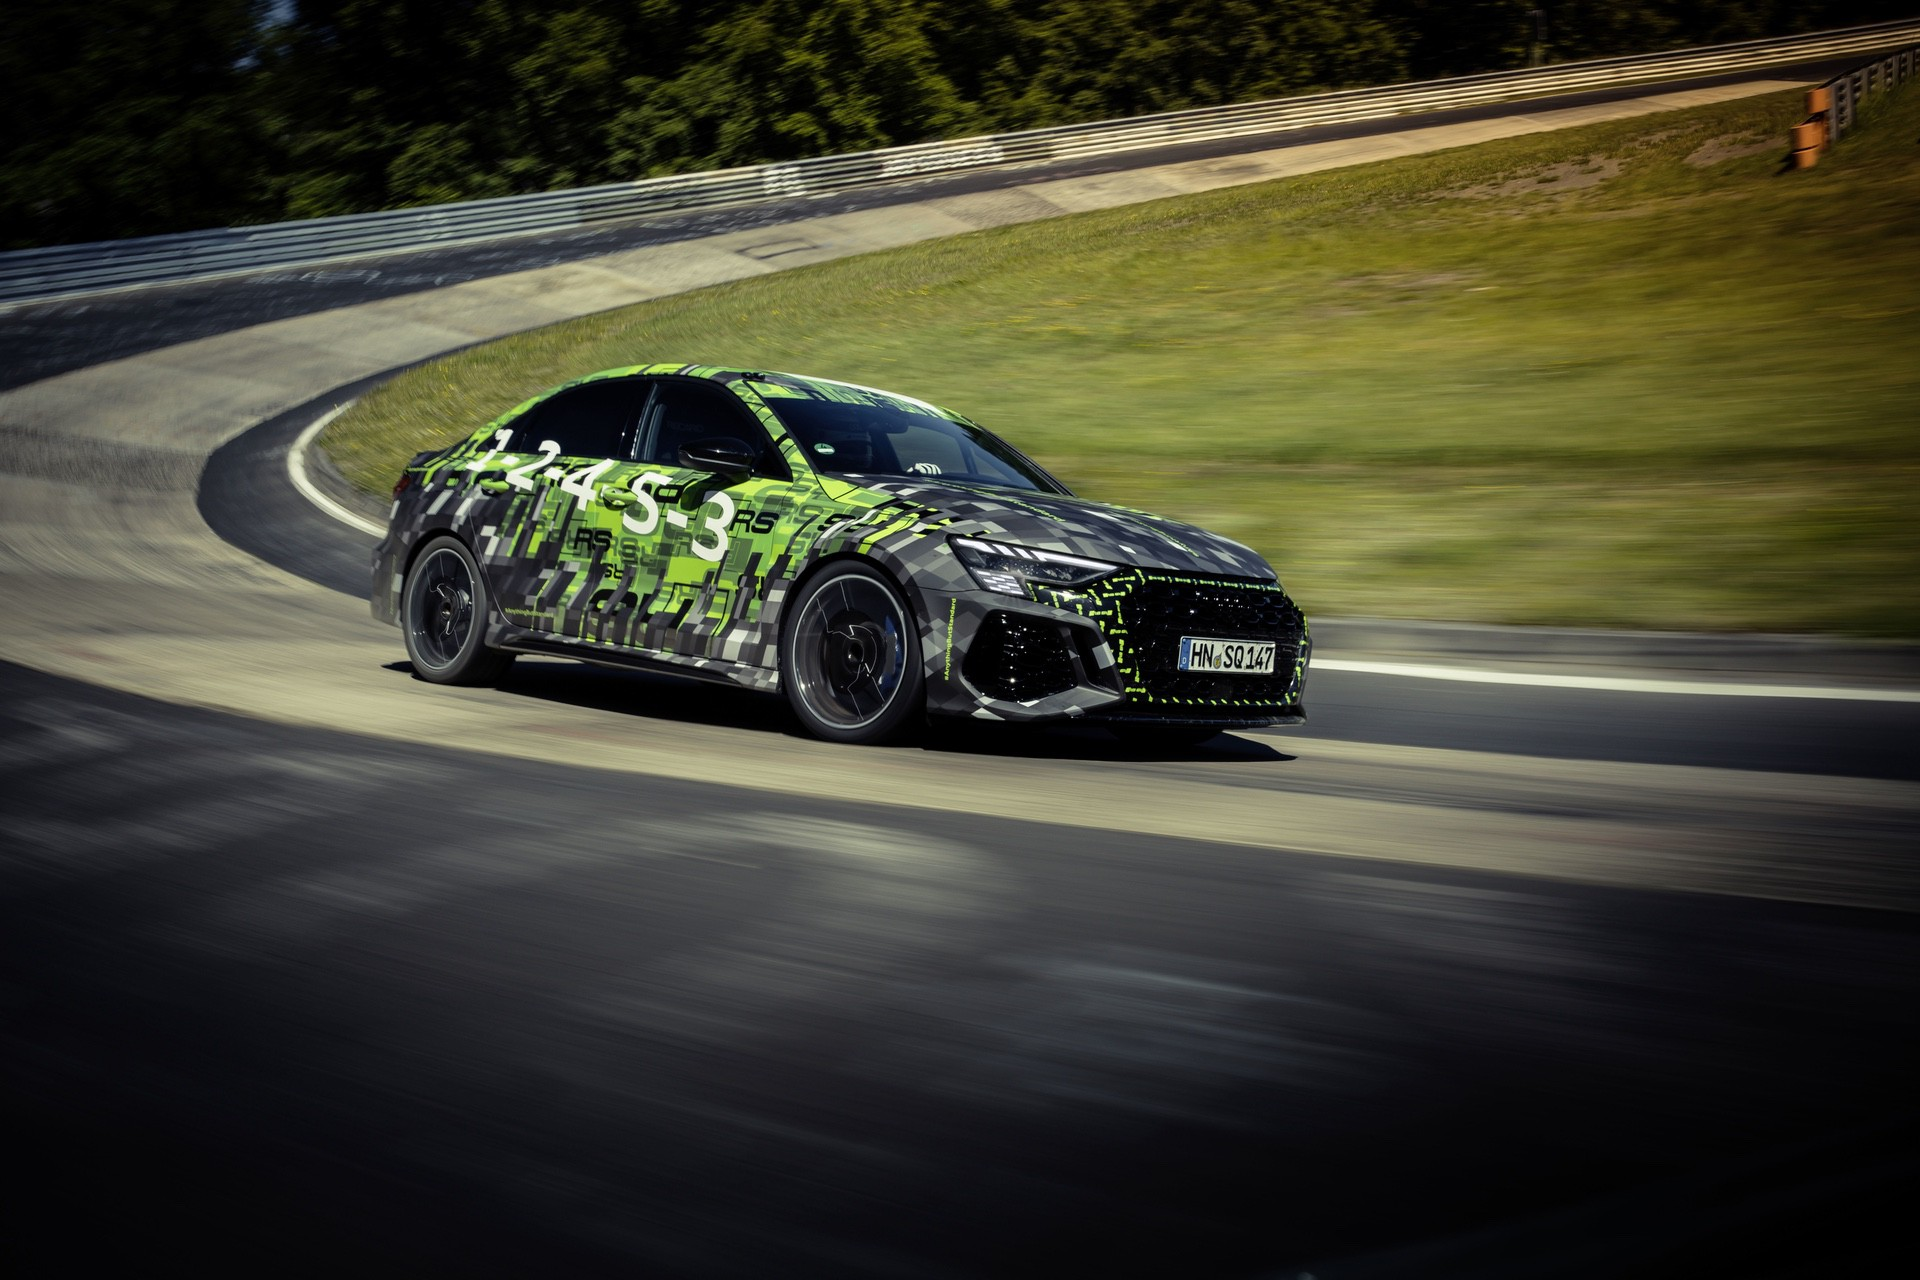 Audi_RS3_Sedan_Nurburgring_lap_record-0012